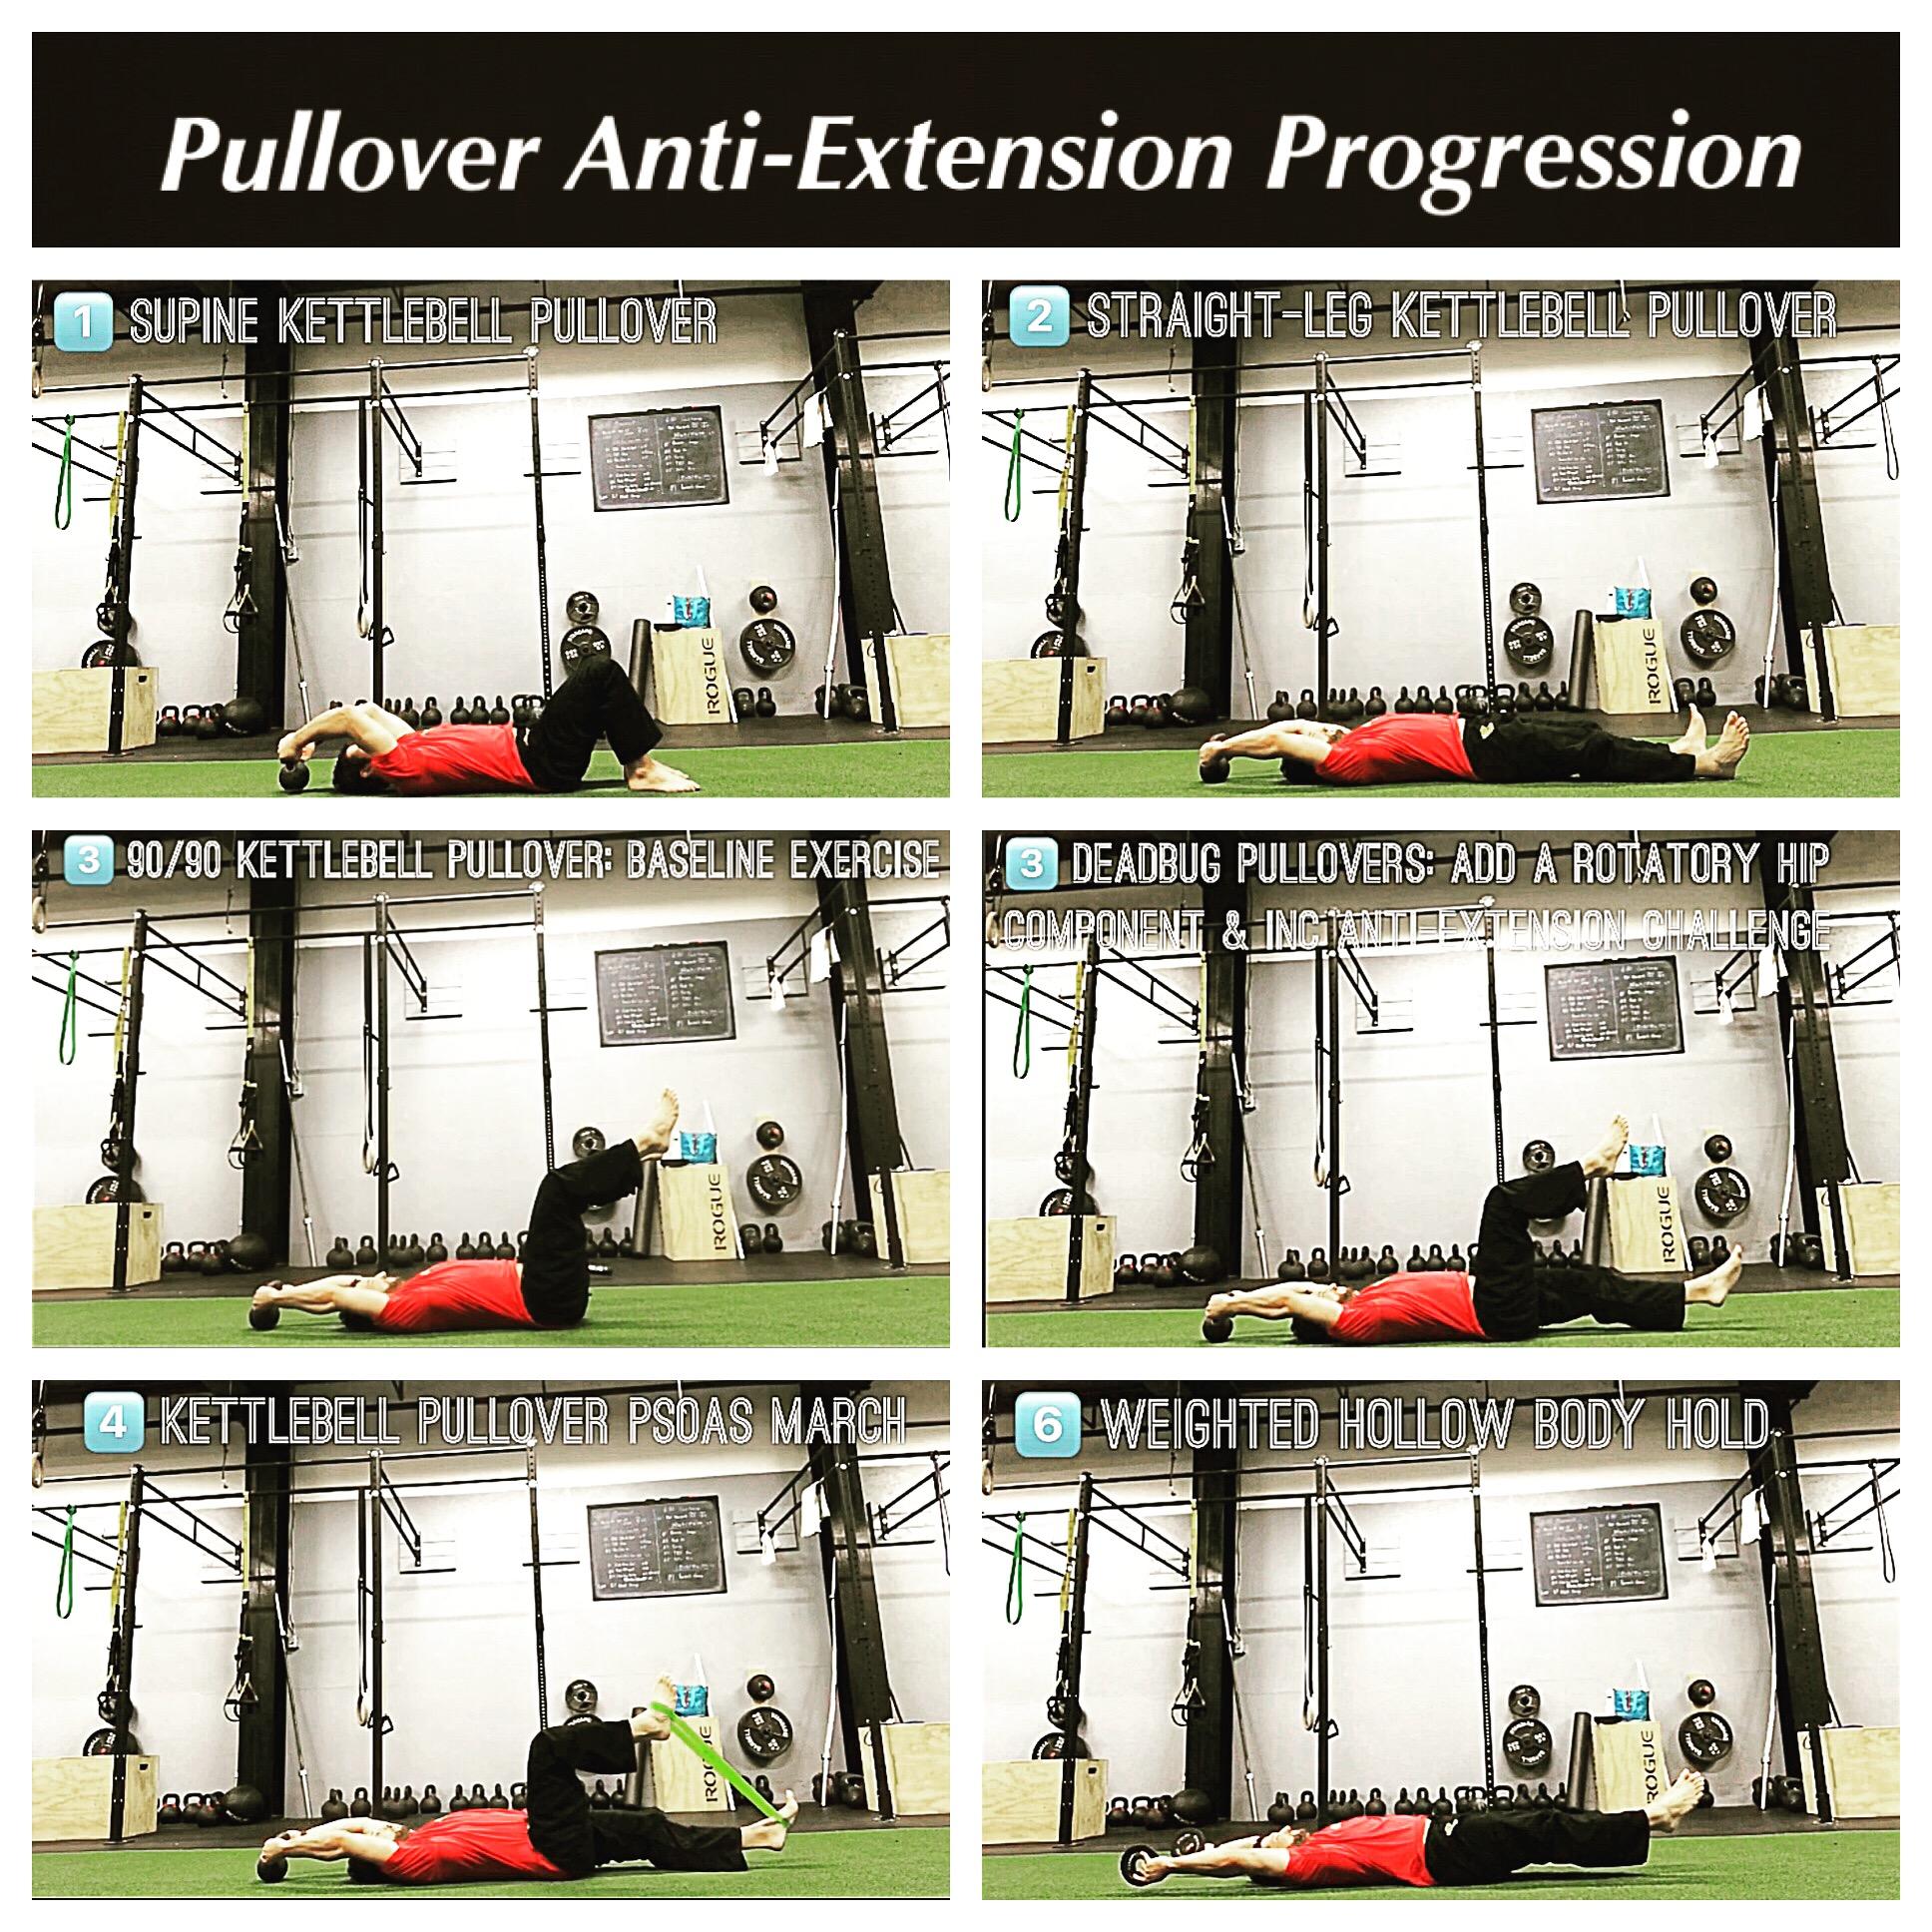 Pullover Anti-Extension Progression.jpg